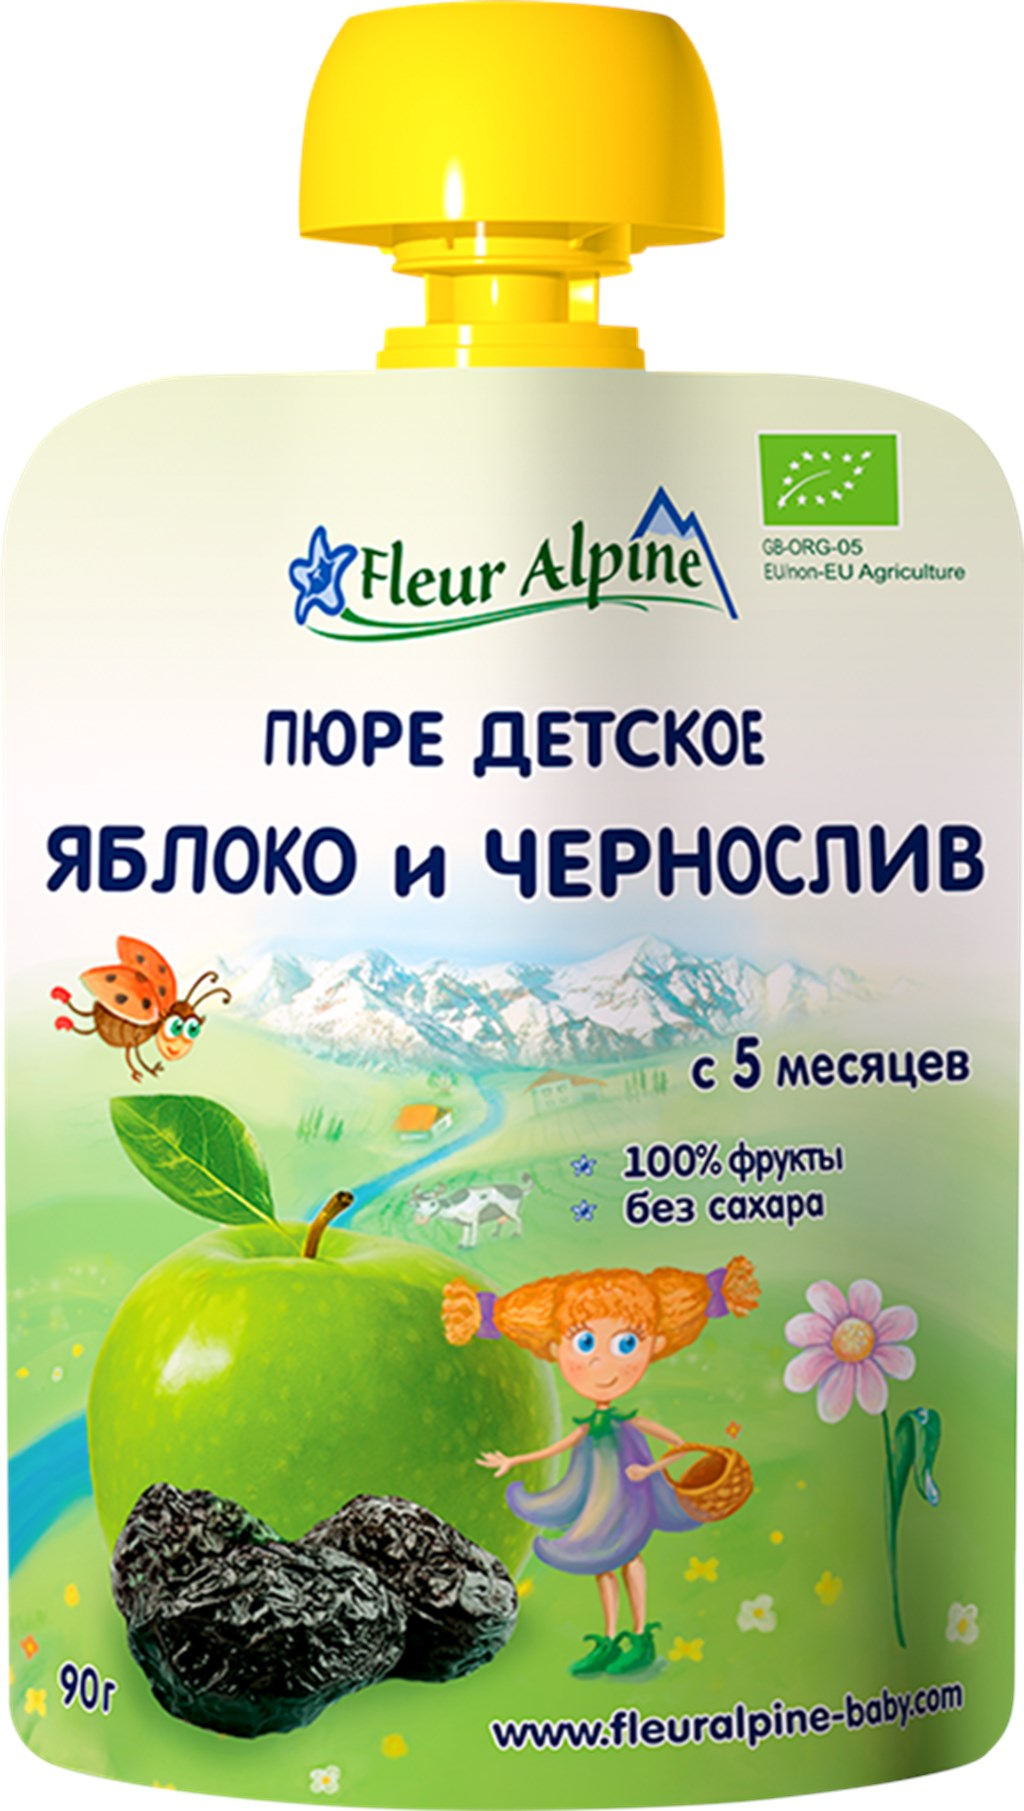 Fleur Alpine (Литва)